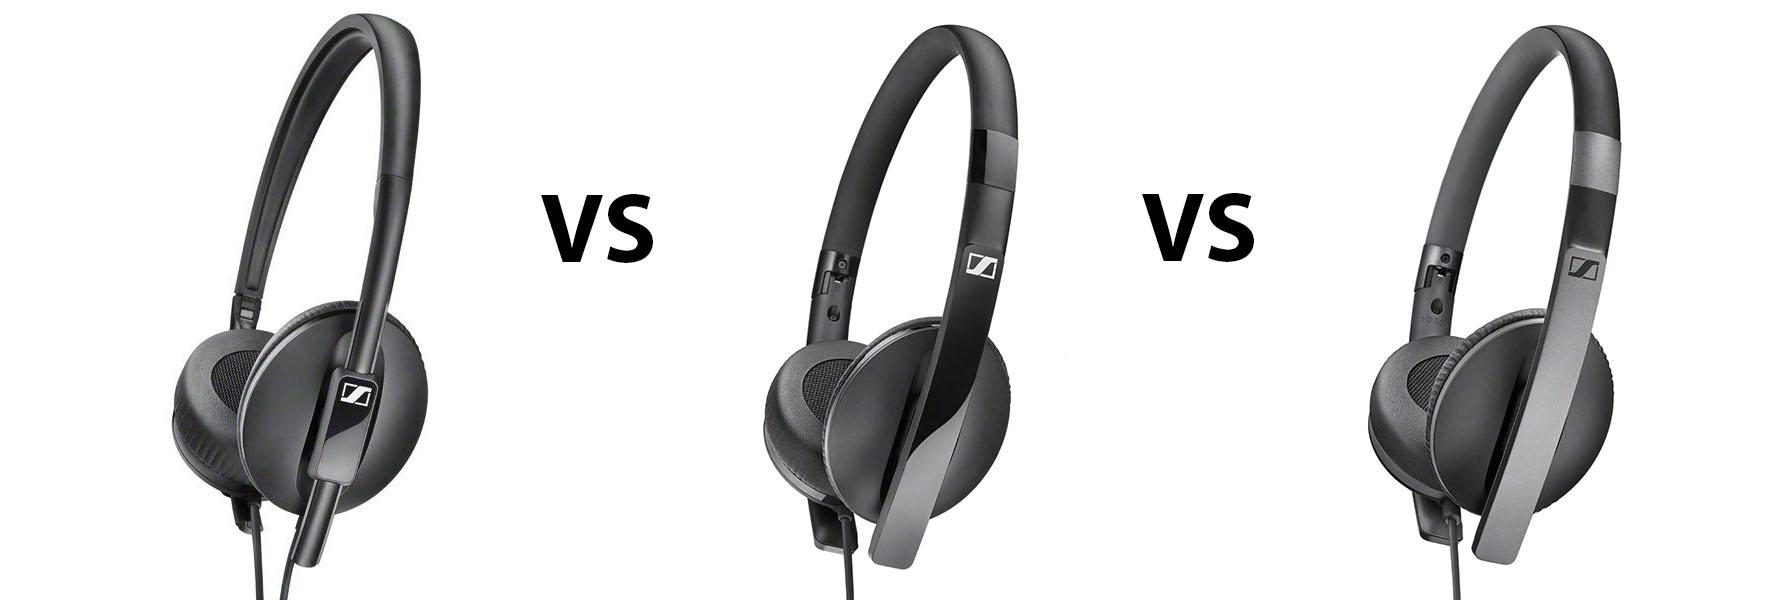 Sennheiser HD 2.10 vs HD 2.20 vs HD 2.30 Comparison Review